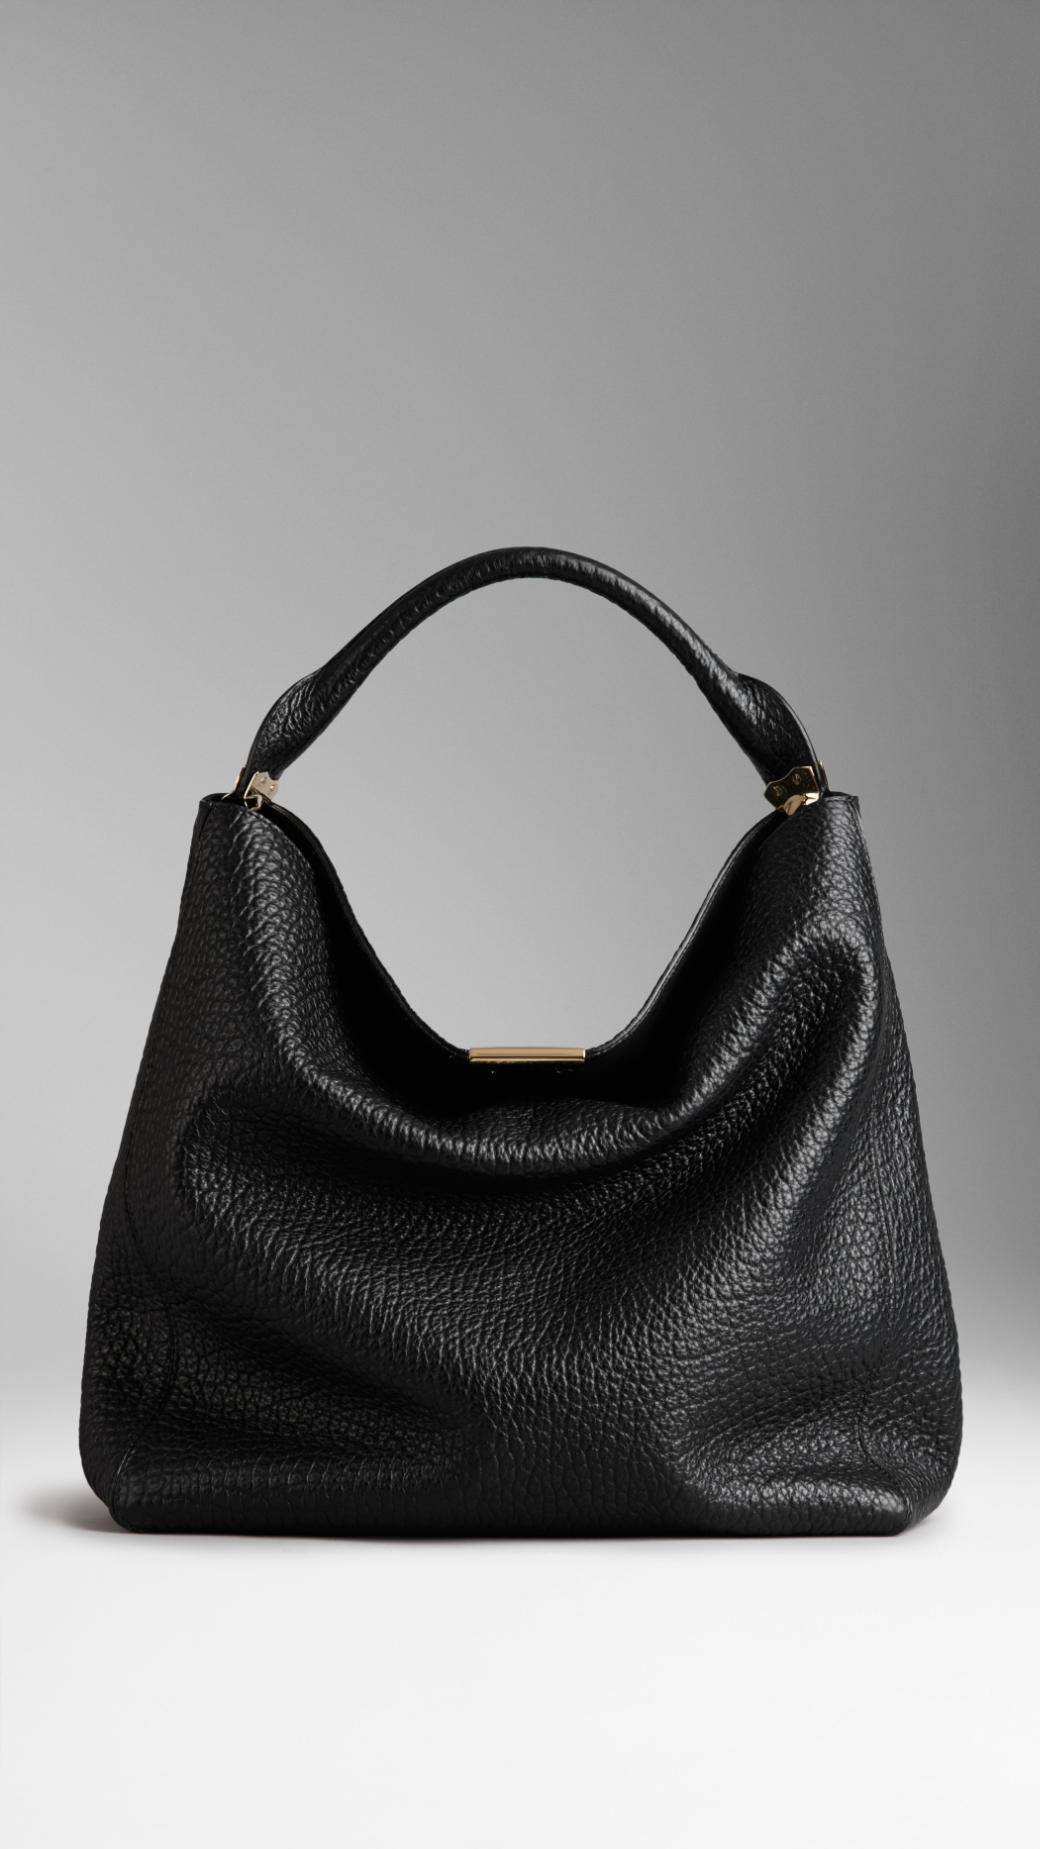 0700b7229319 Lyst - Burberry Medium Signature Grain Leather Hobo Bag in Black